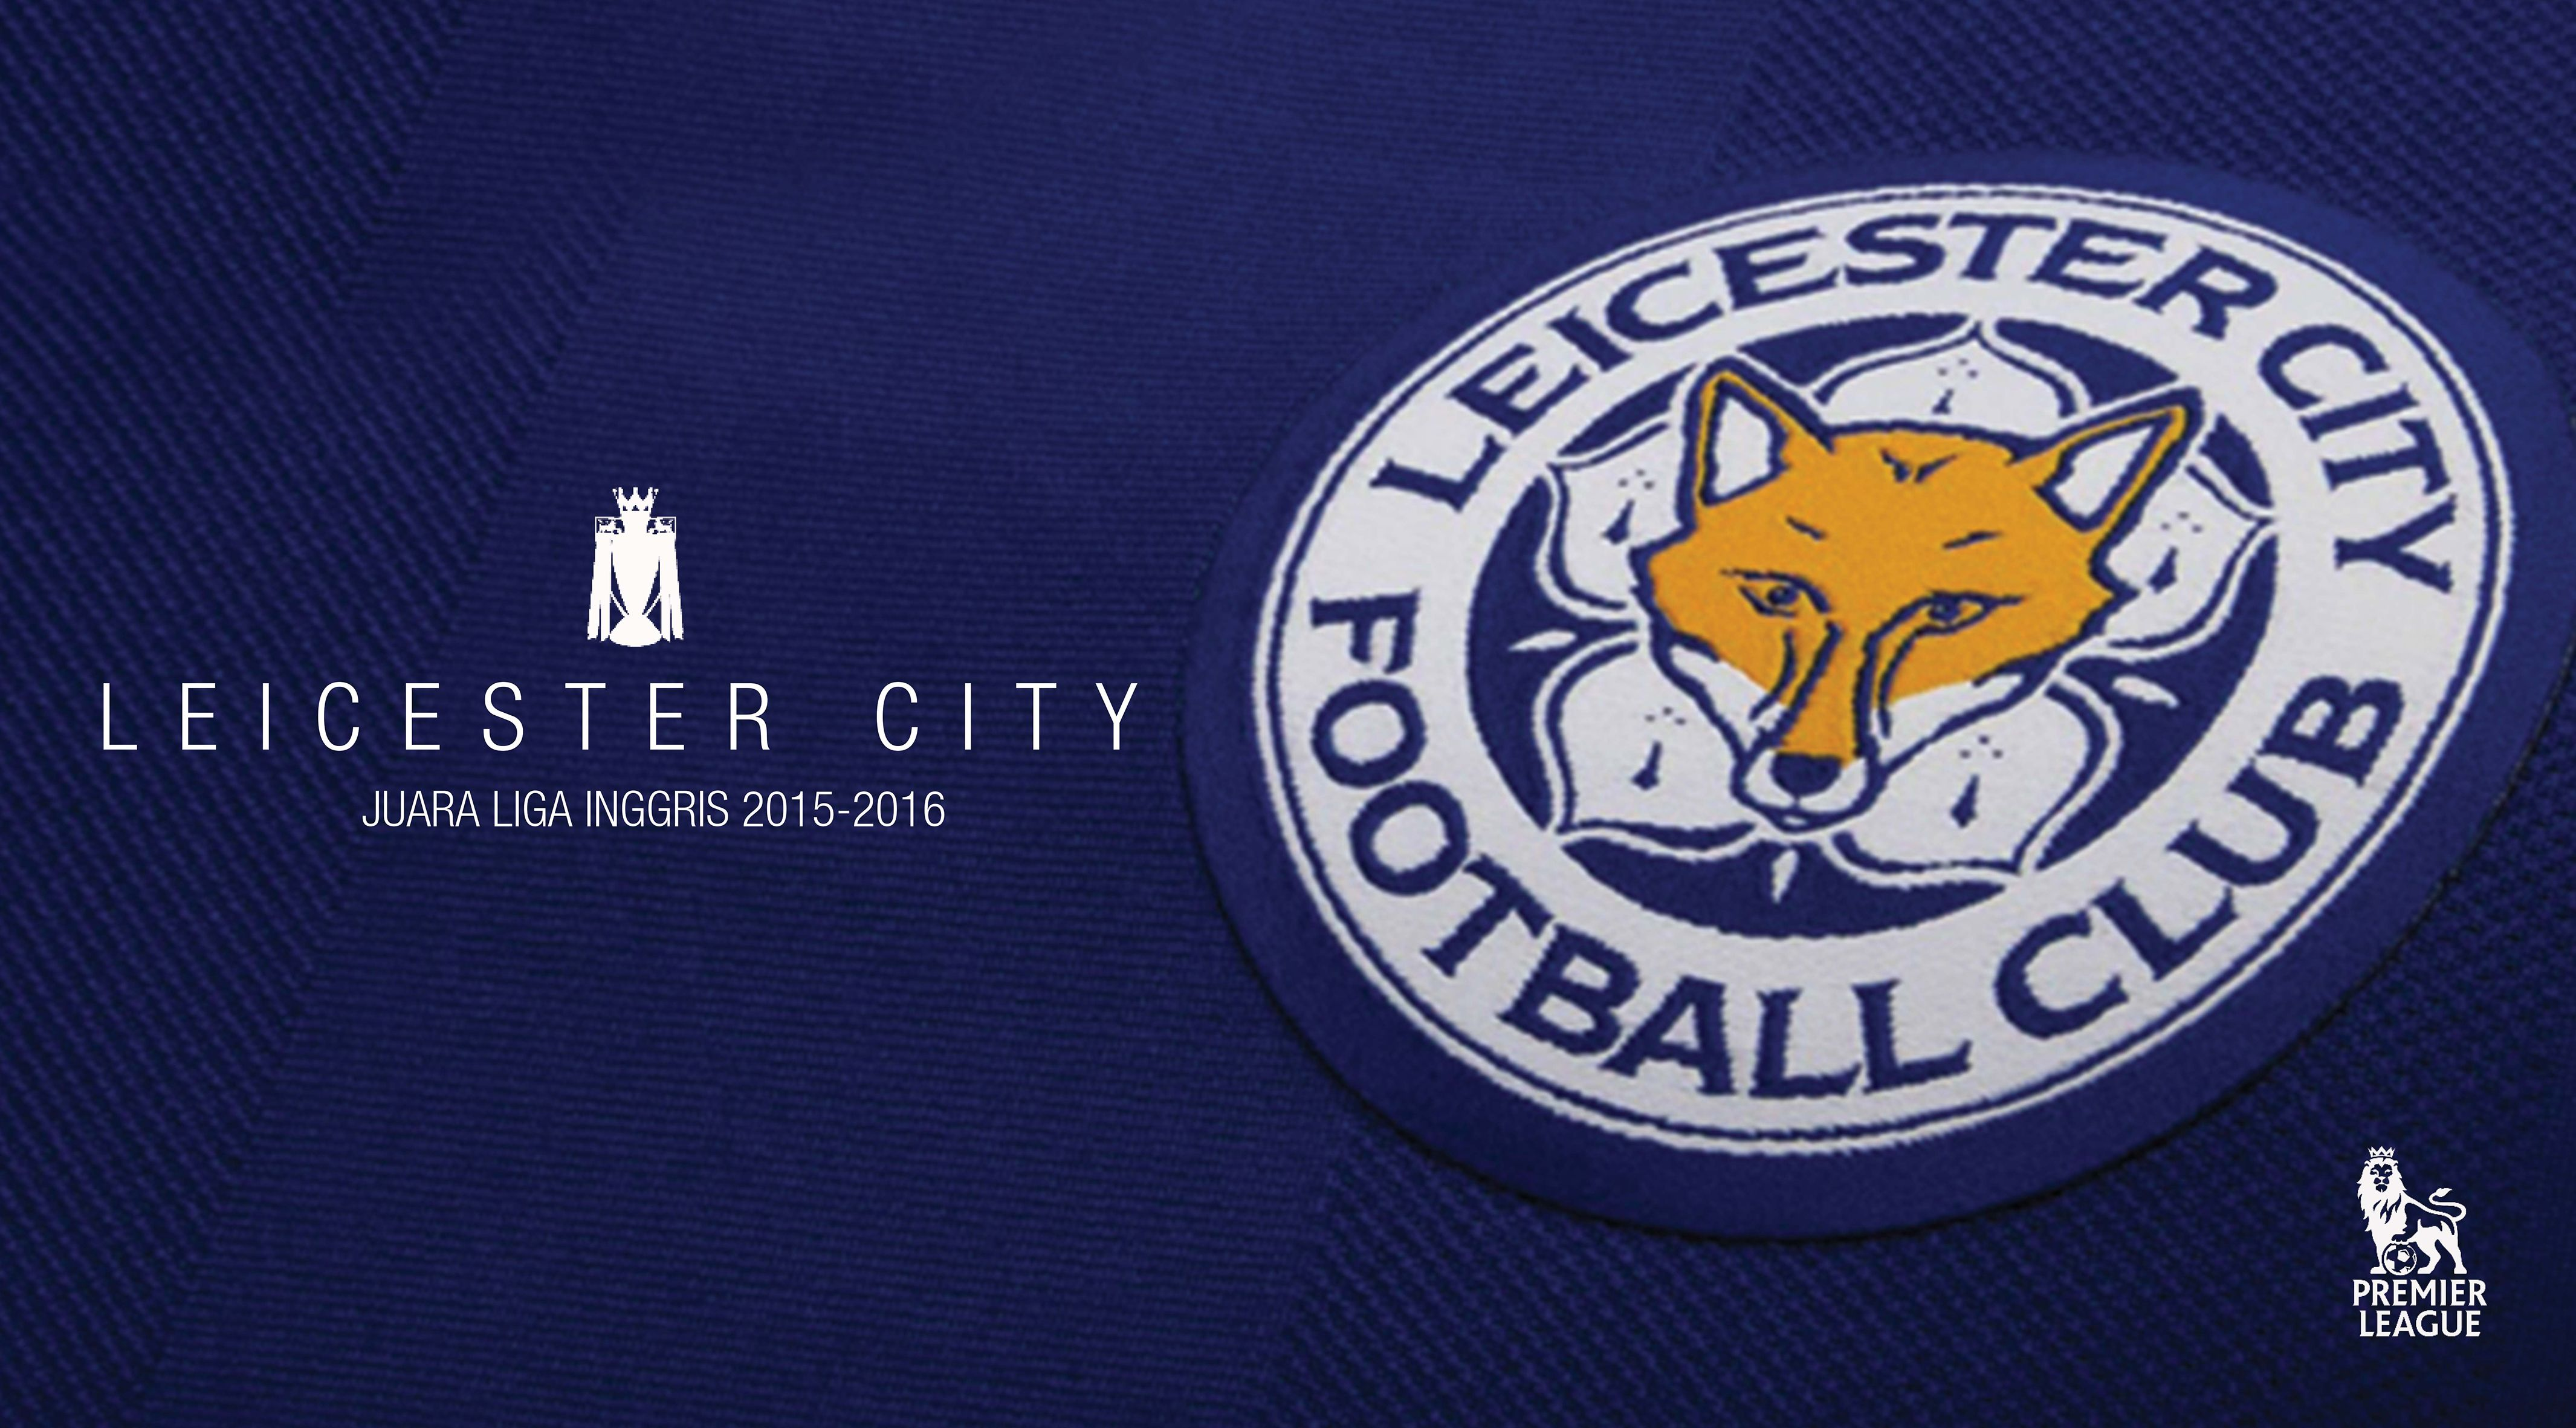 Leicester City (Abdillah/Liputan6.com)